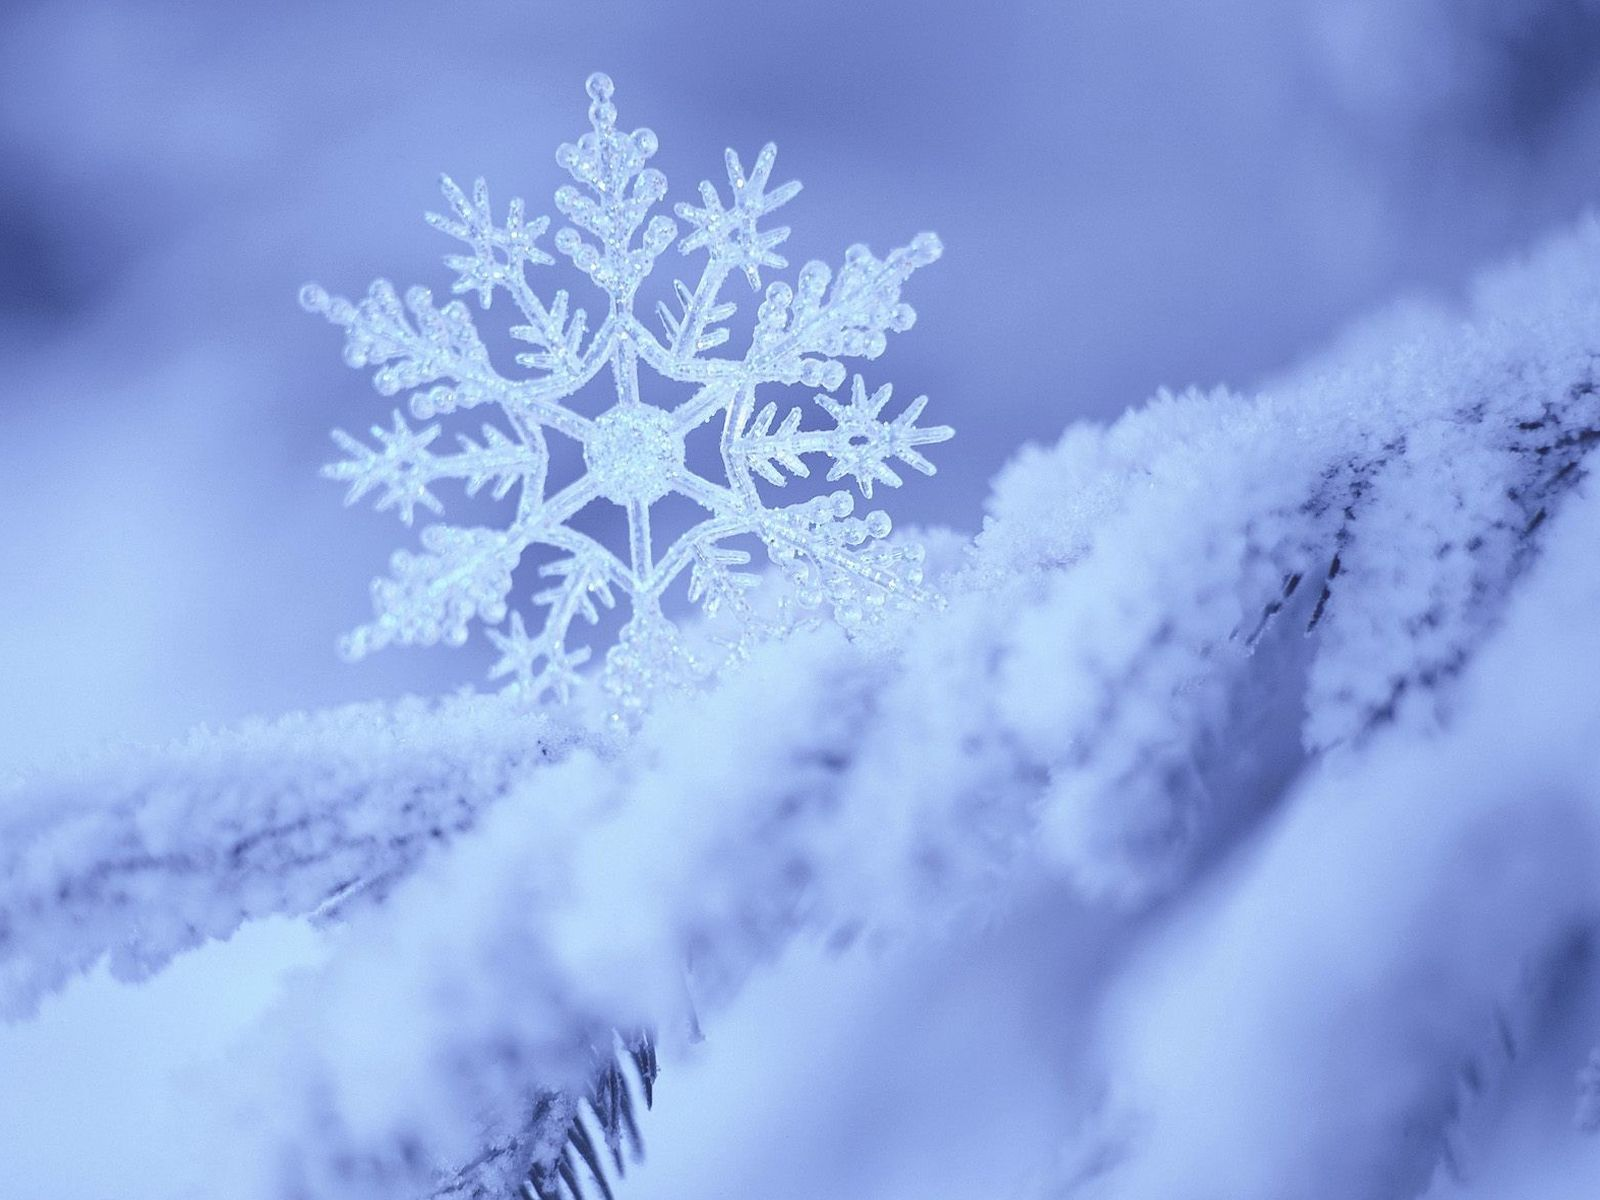 Снежинка 1600 x 1200